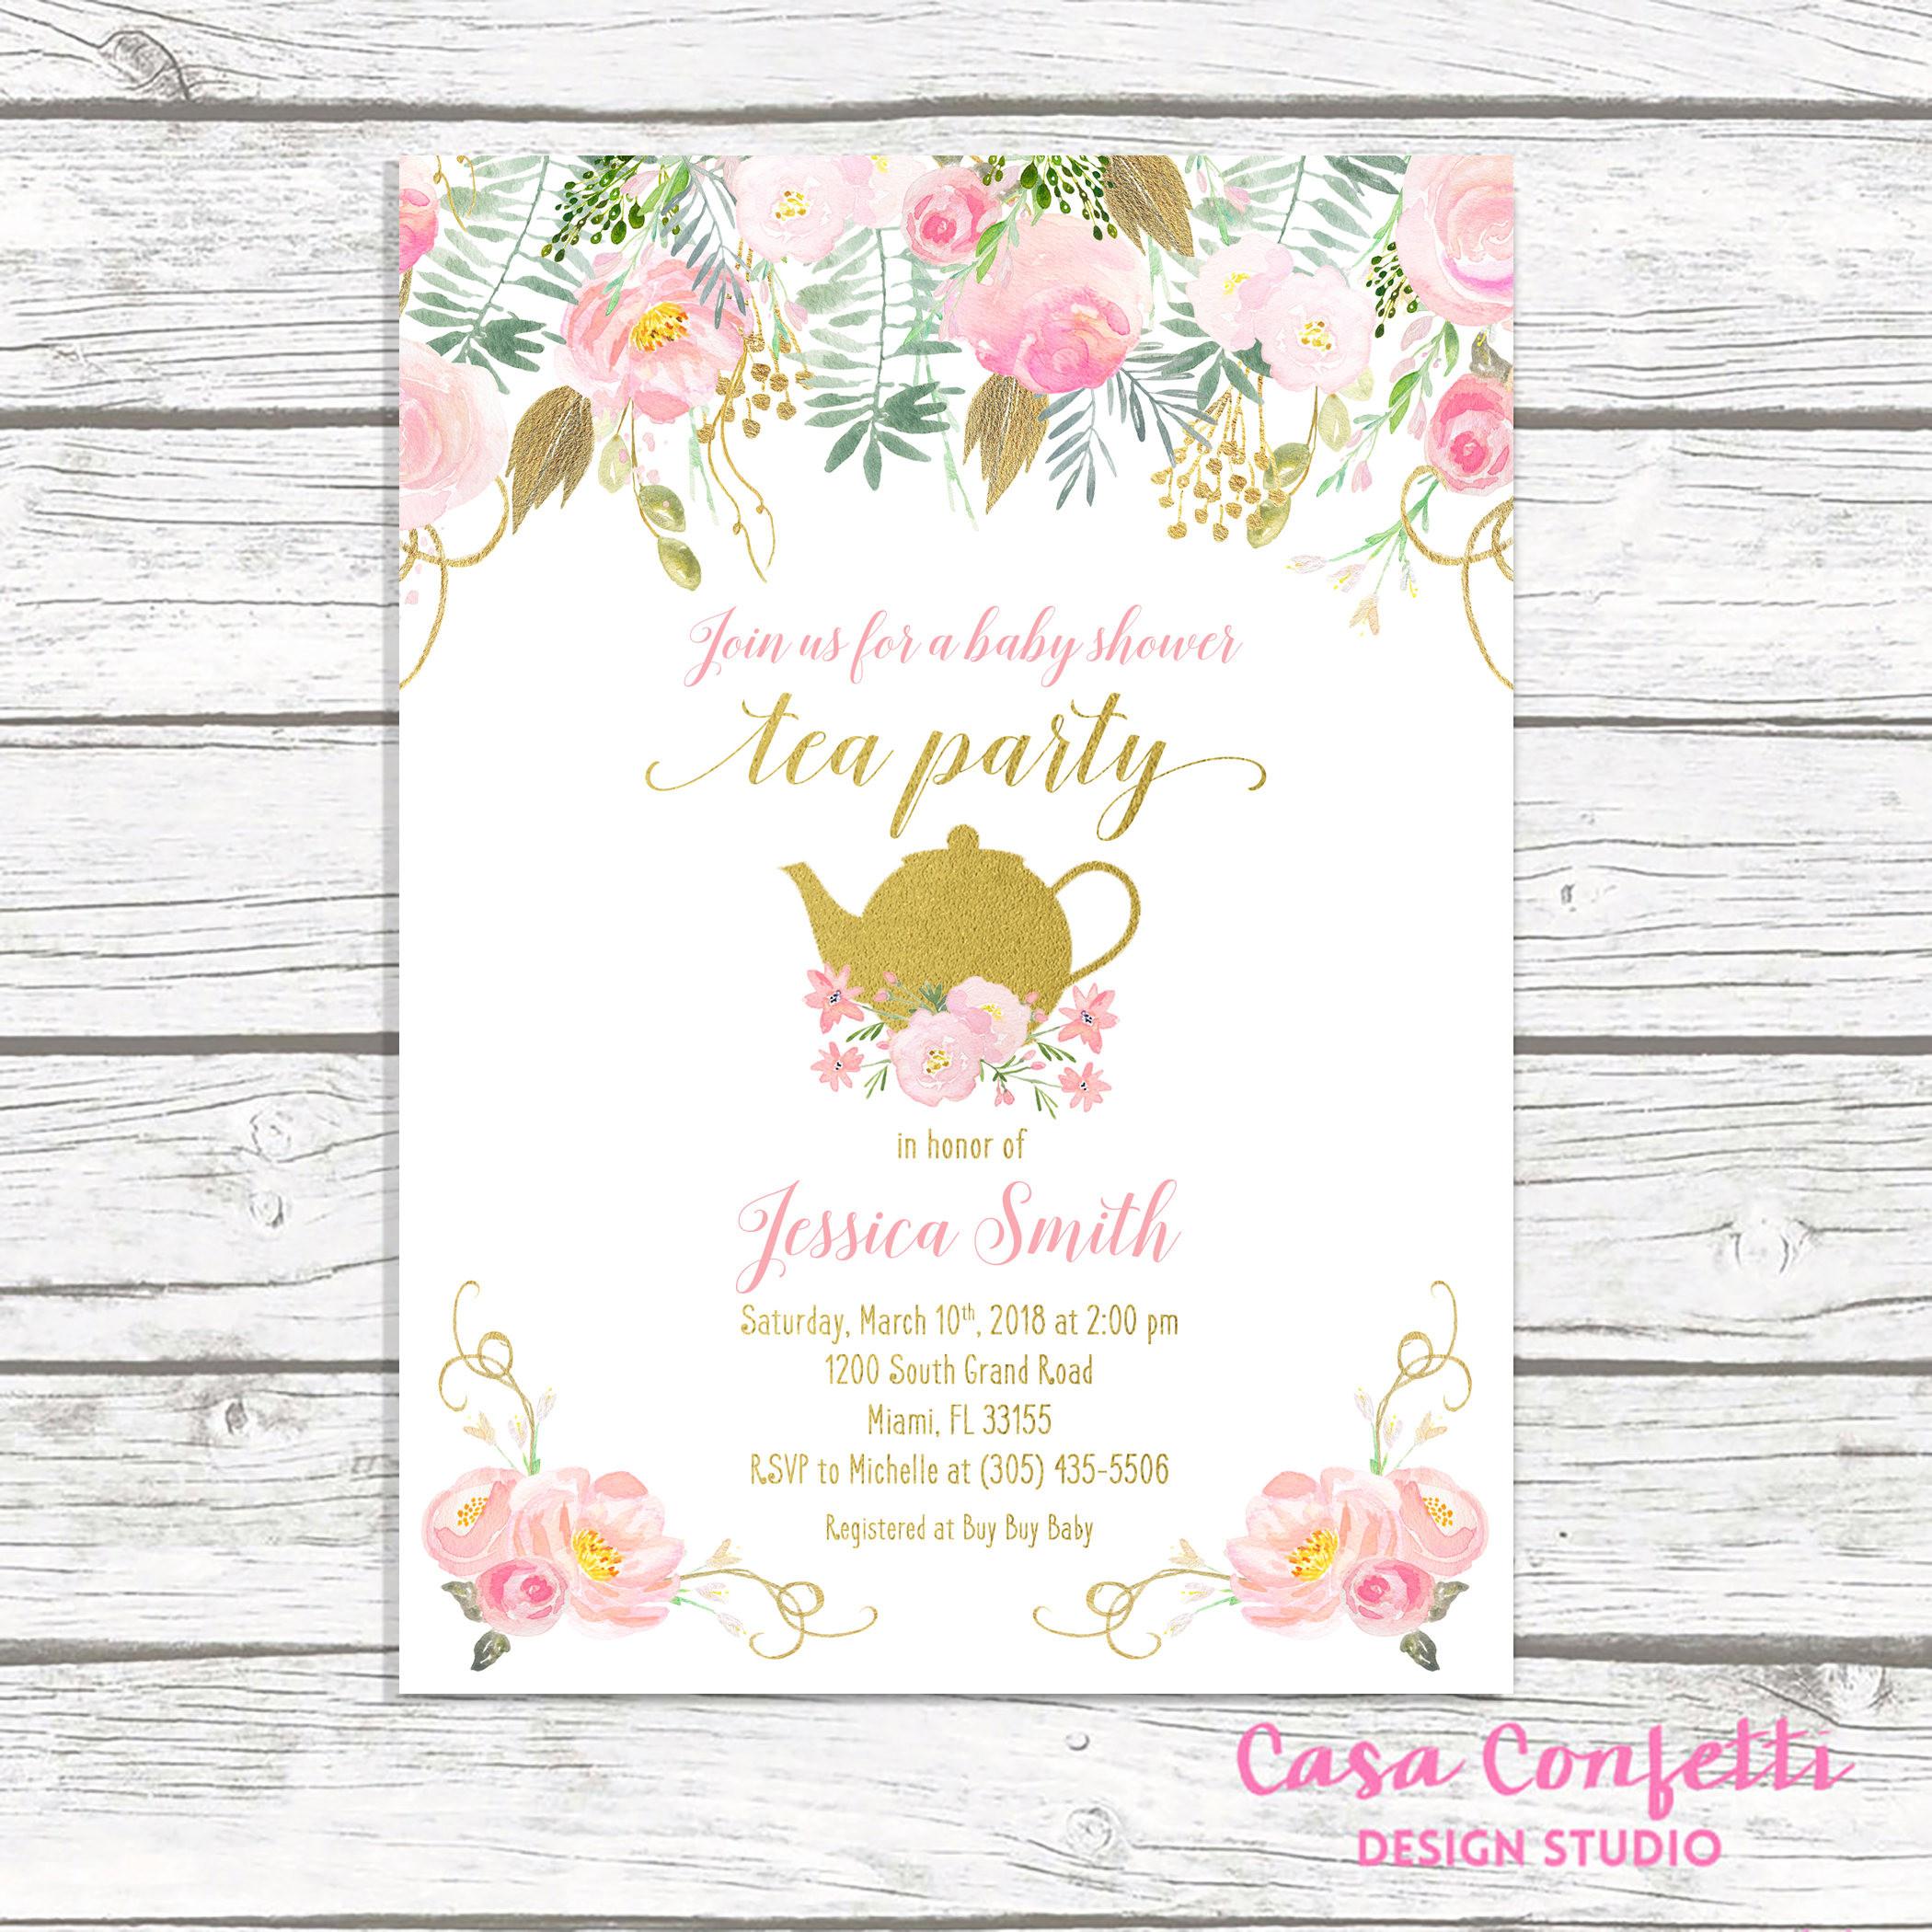 Baby Shower Invitations Tea Party  Tea Party Baby Shower Invitation Tea Party Invitation